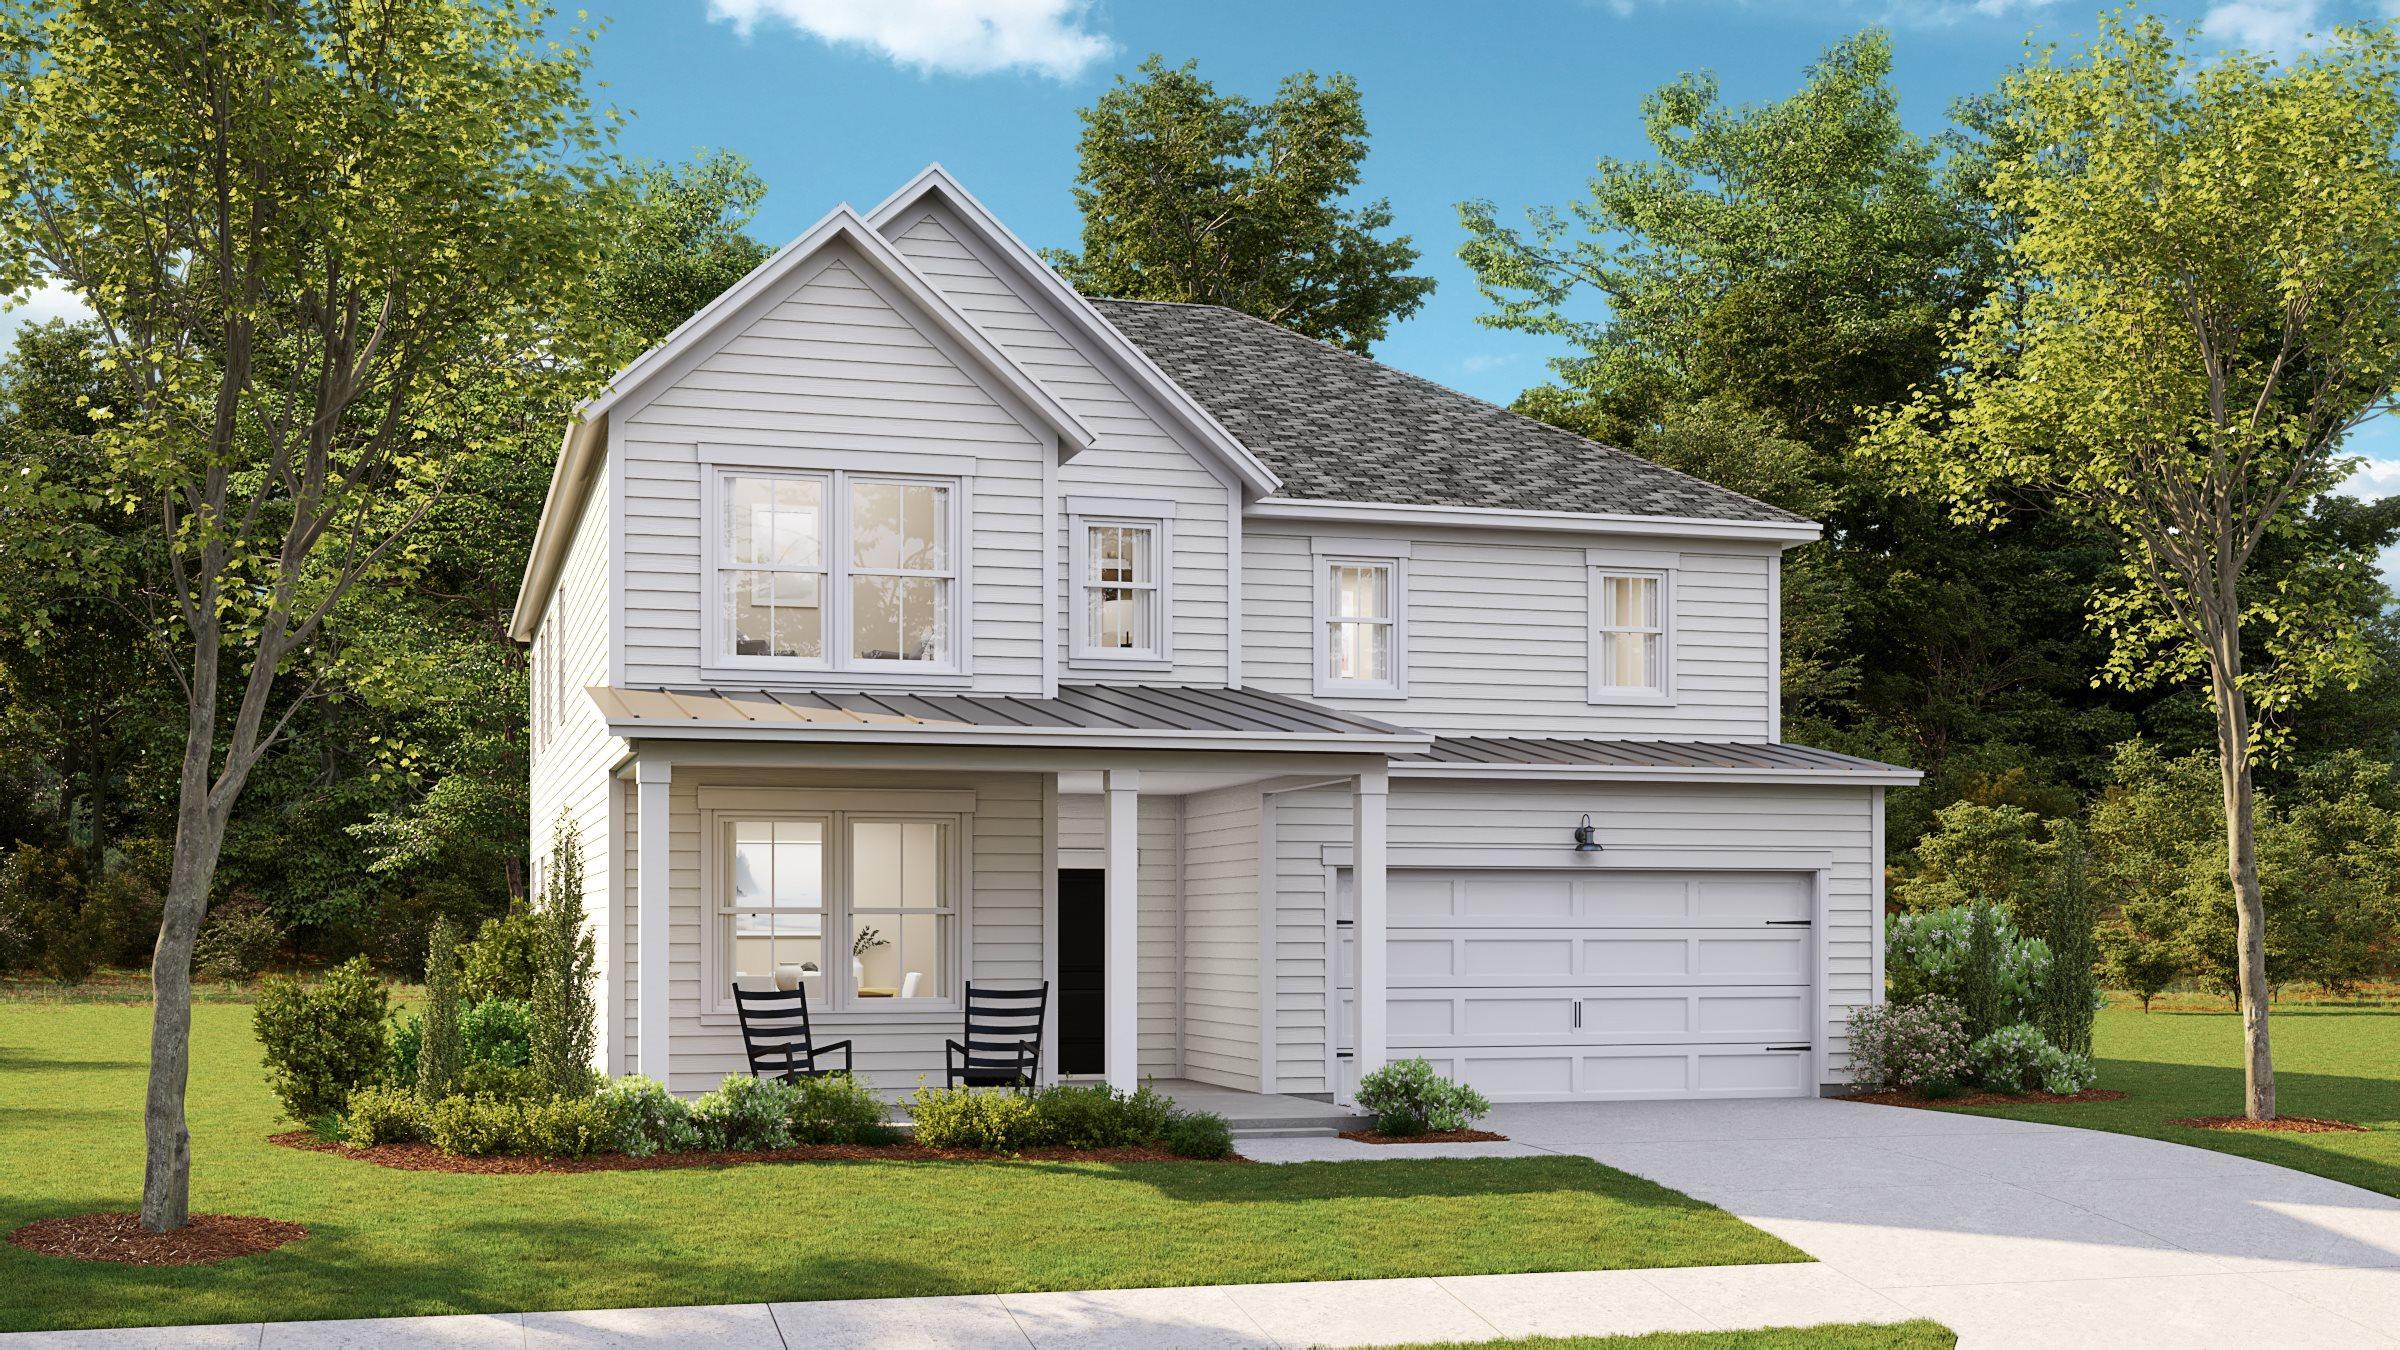 Cane Bay Plantation Homes For Sale - 185 Granton Edge, Summerville, SC - 11